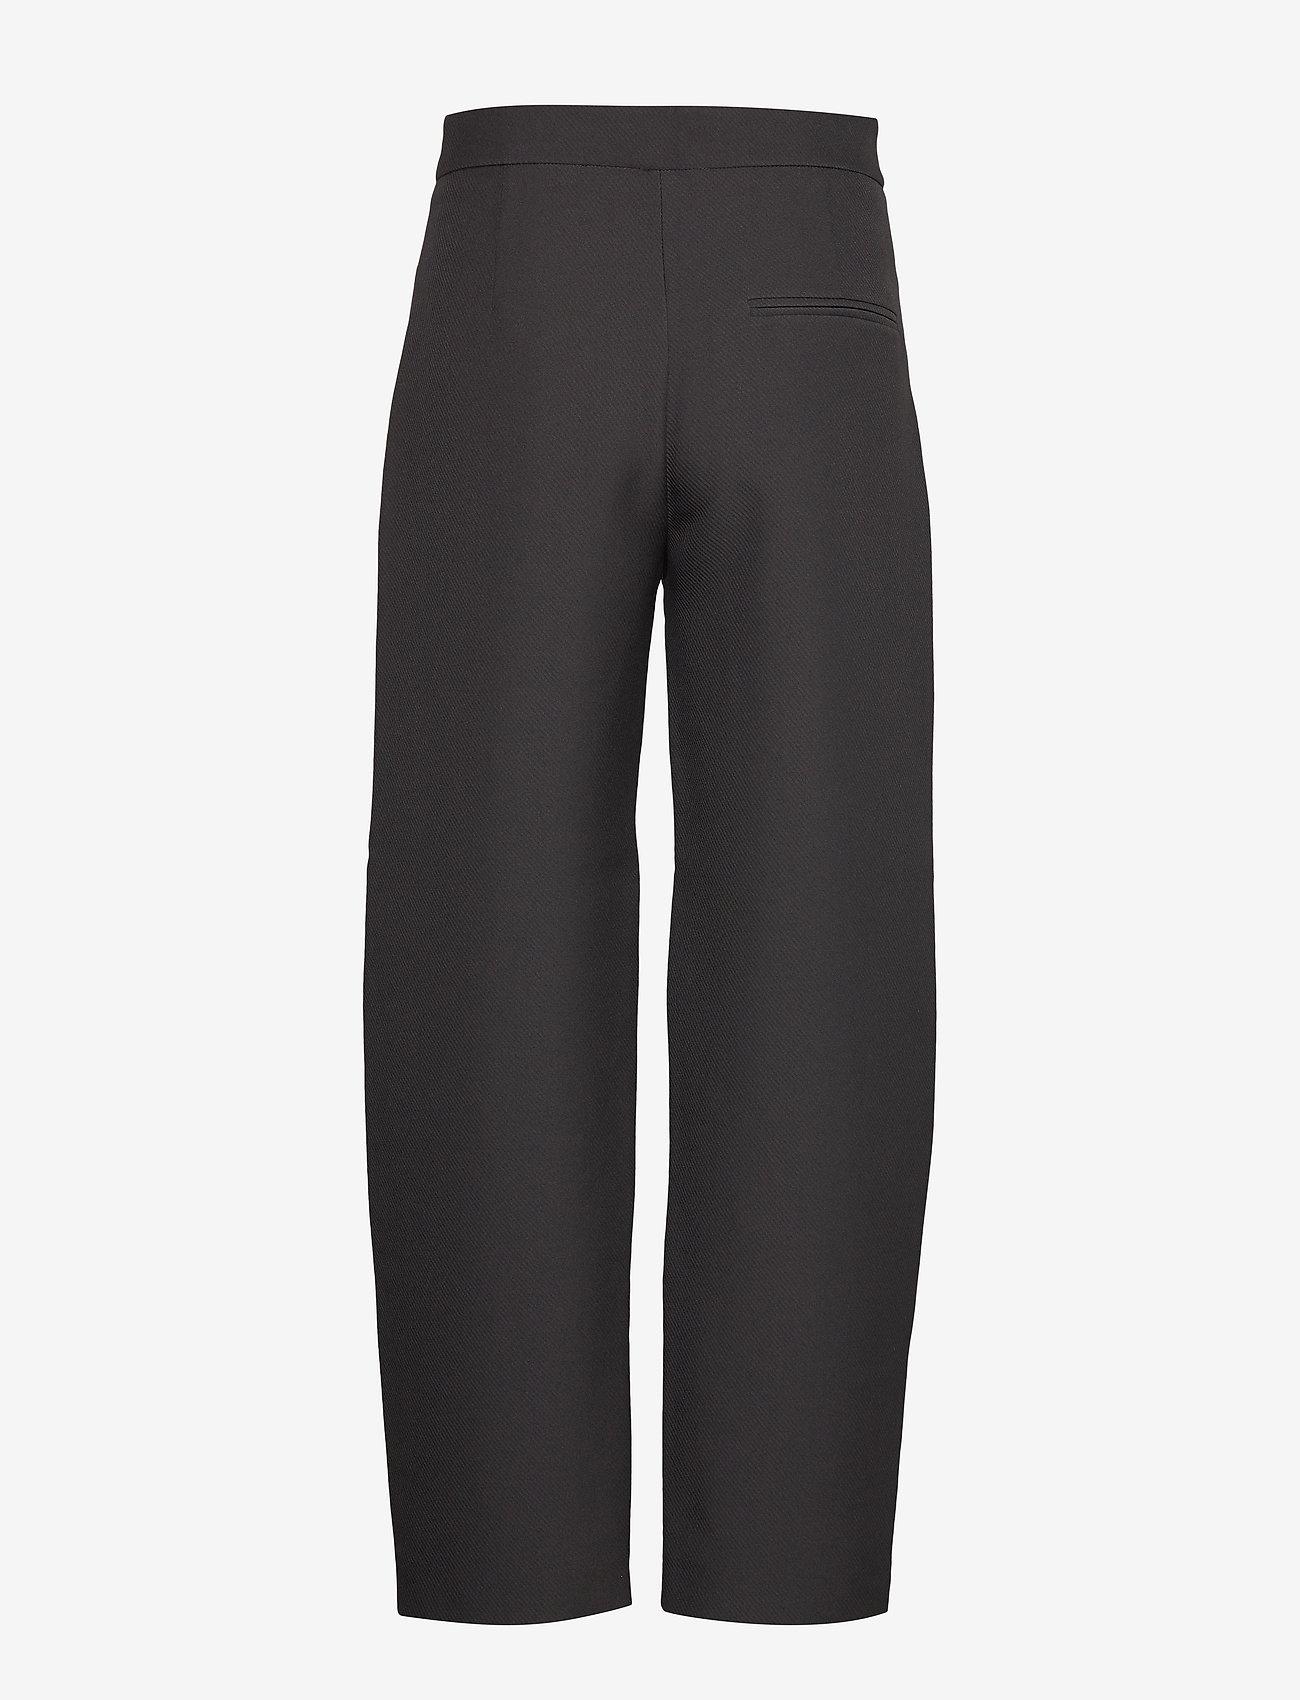 Totême - NOVARA - bukser med brede ben - black 200 - 1